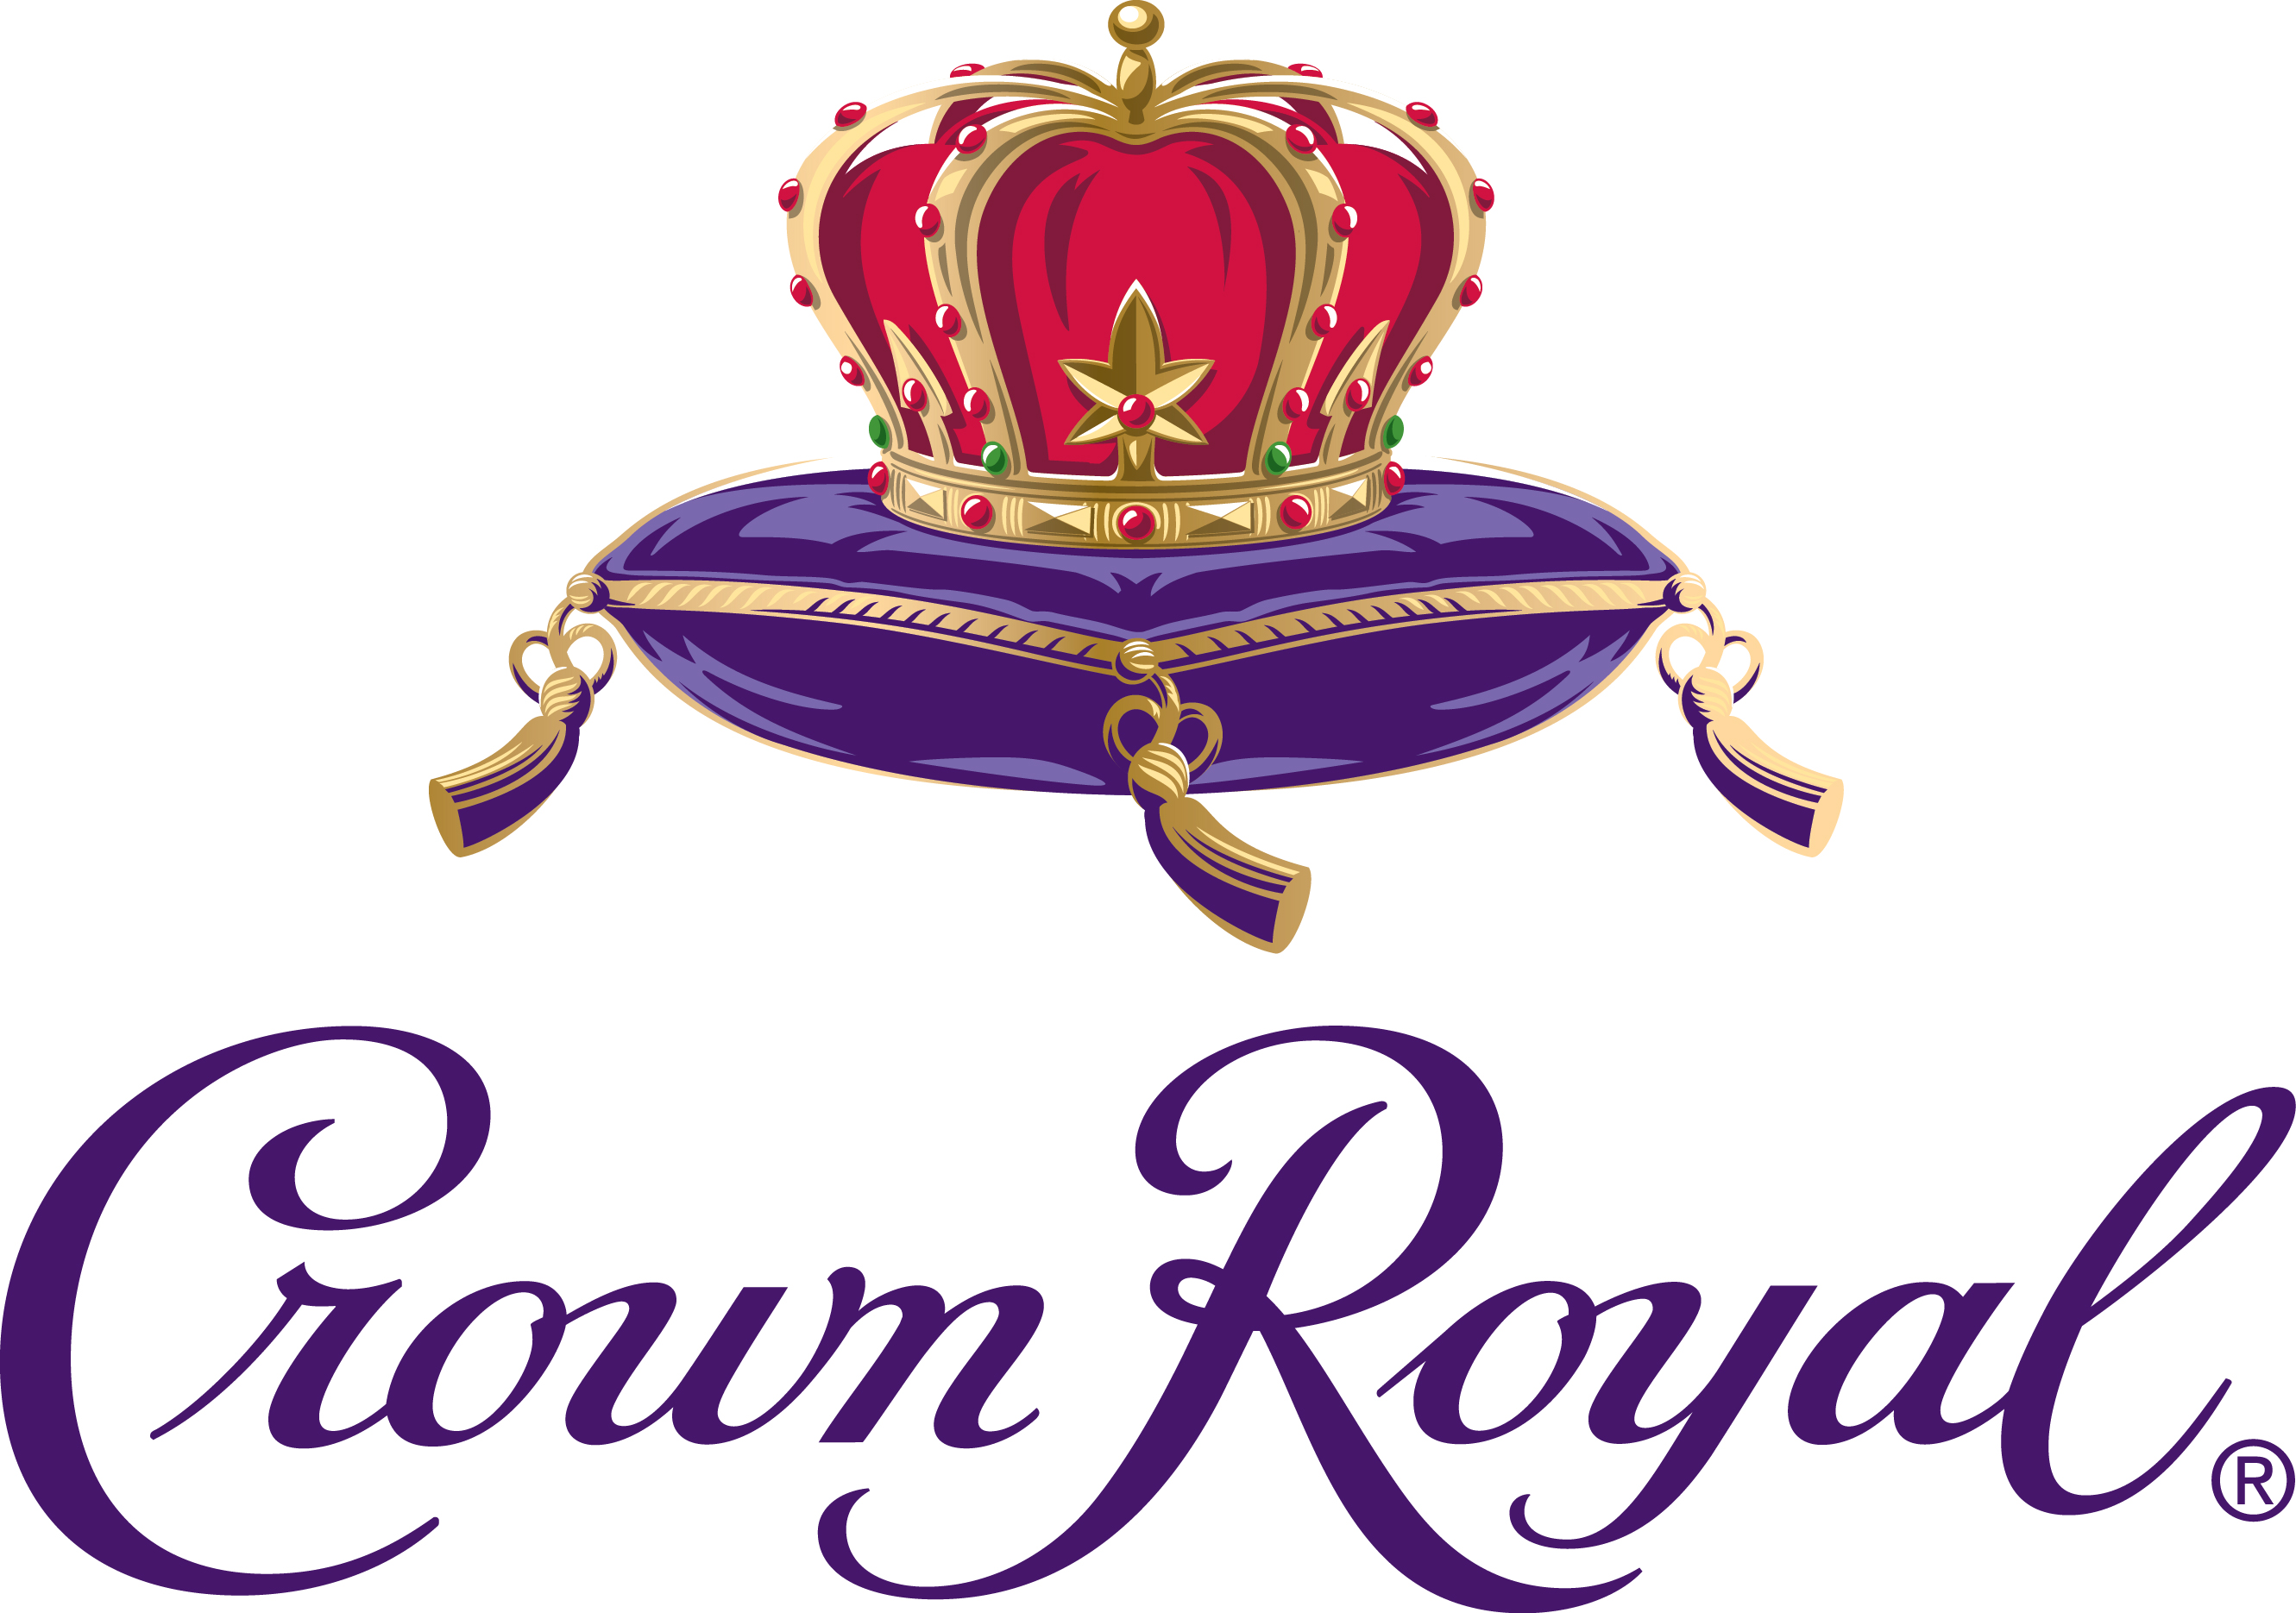 2661x1870 Crown Royal Logos